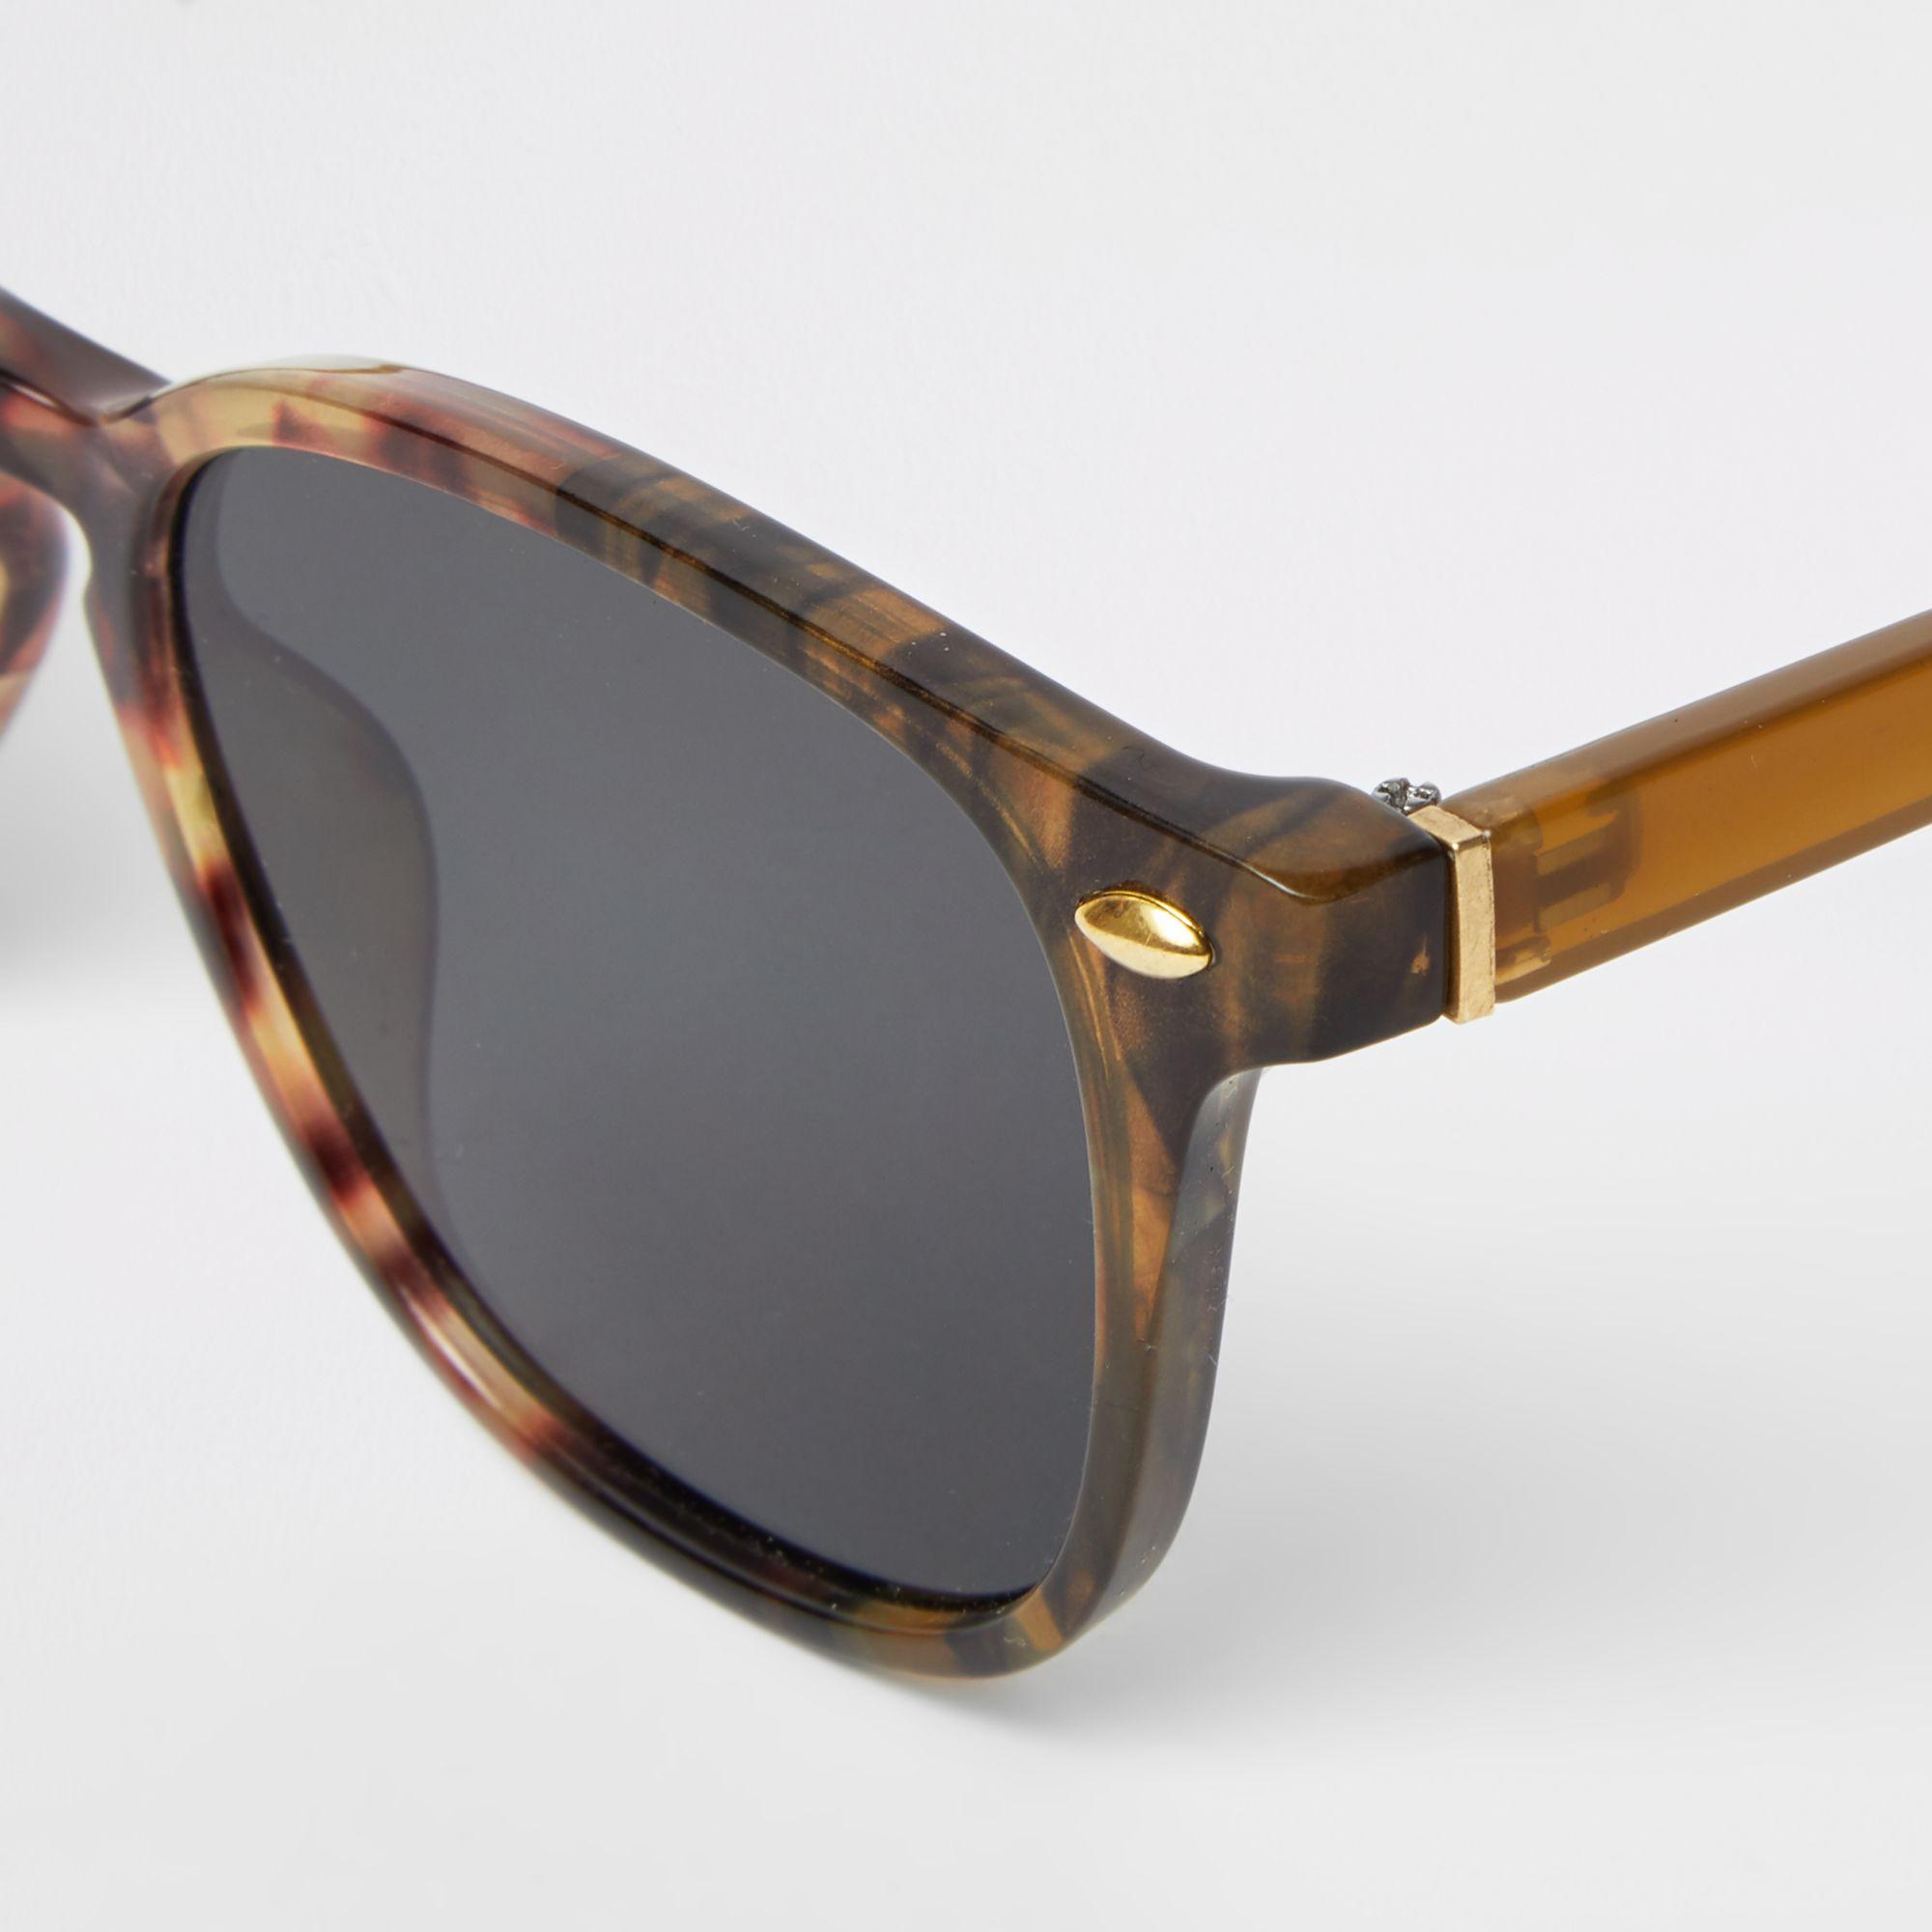 aa15e12b1a River Island Black smoke lens slim retro square sunglasses at £12 ...